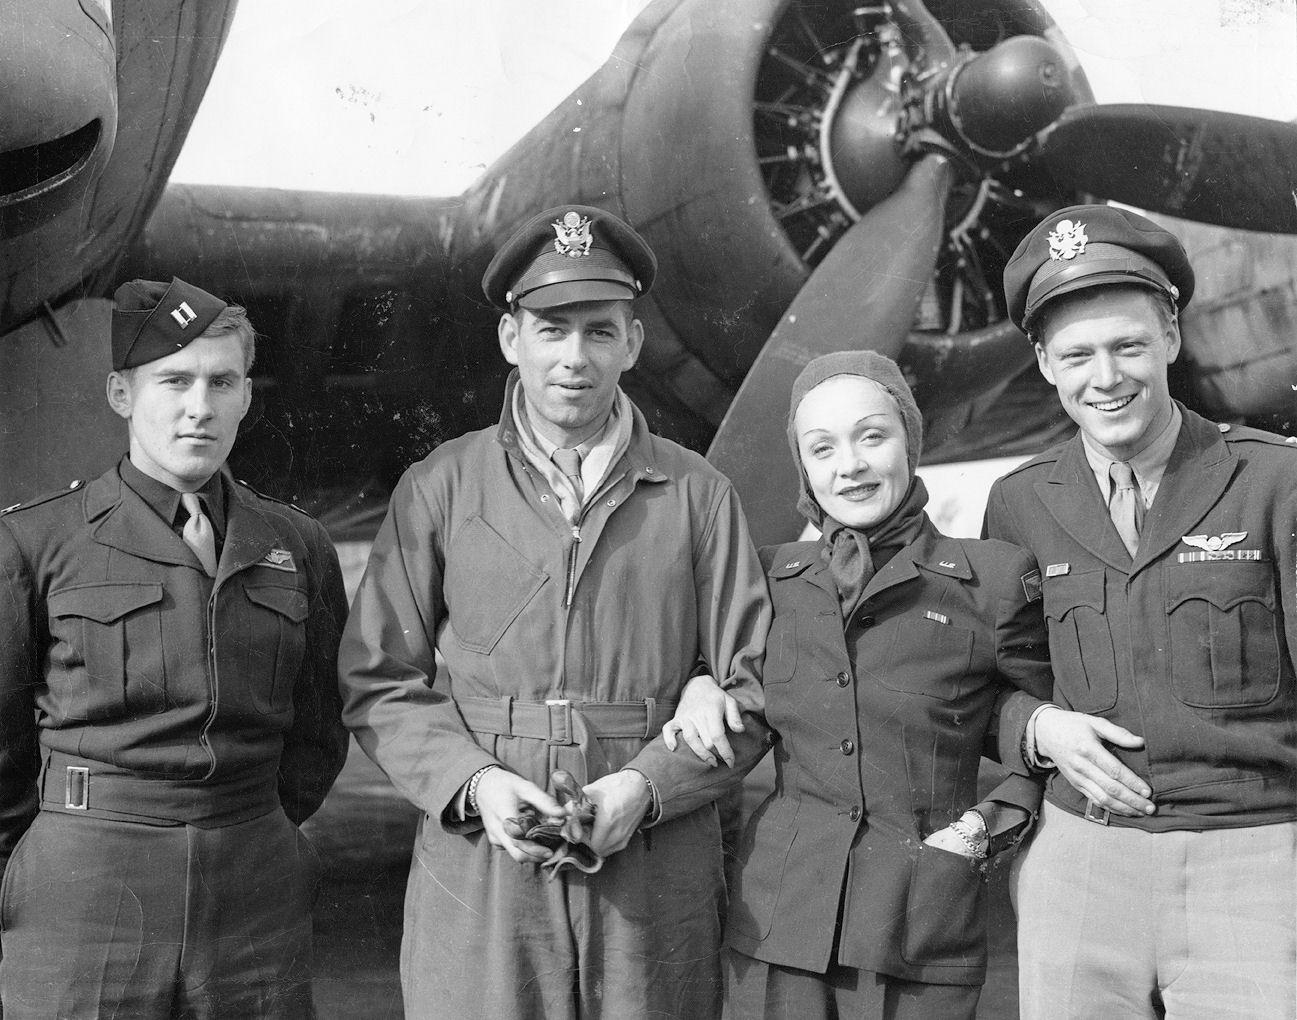 RAF_Deenethorpe_-_401st_Bombardment_Group_Marlene_Dietrich